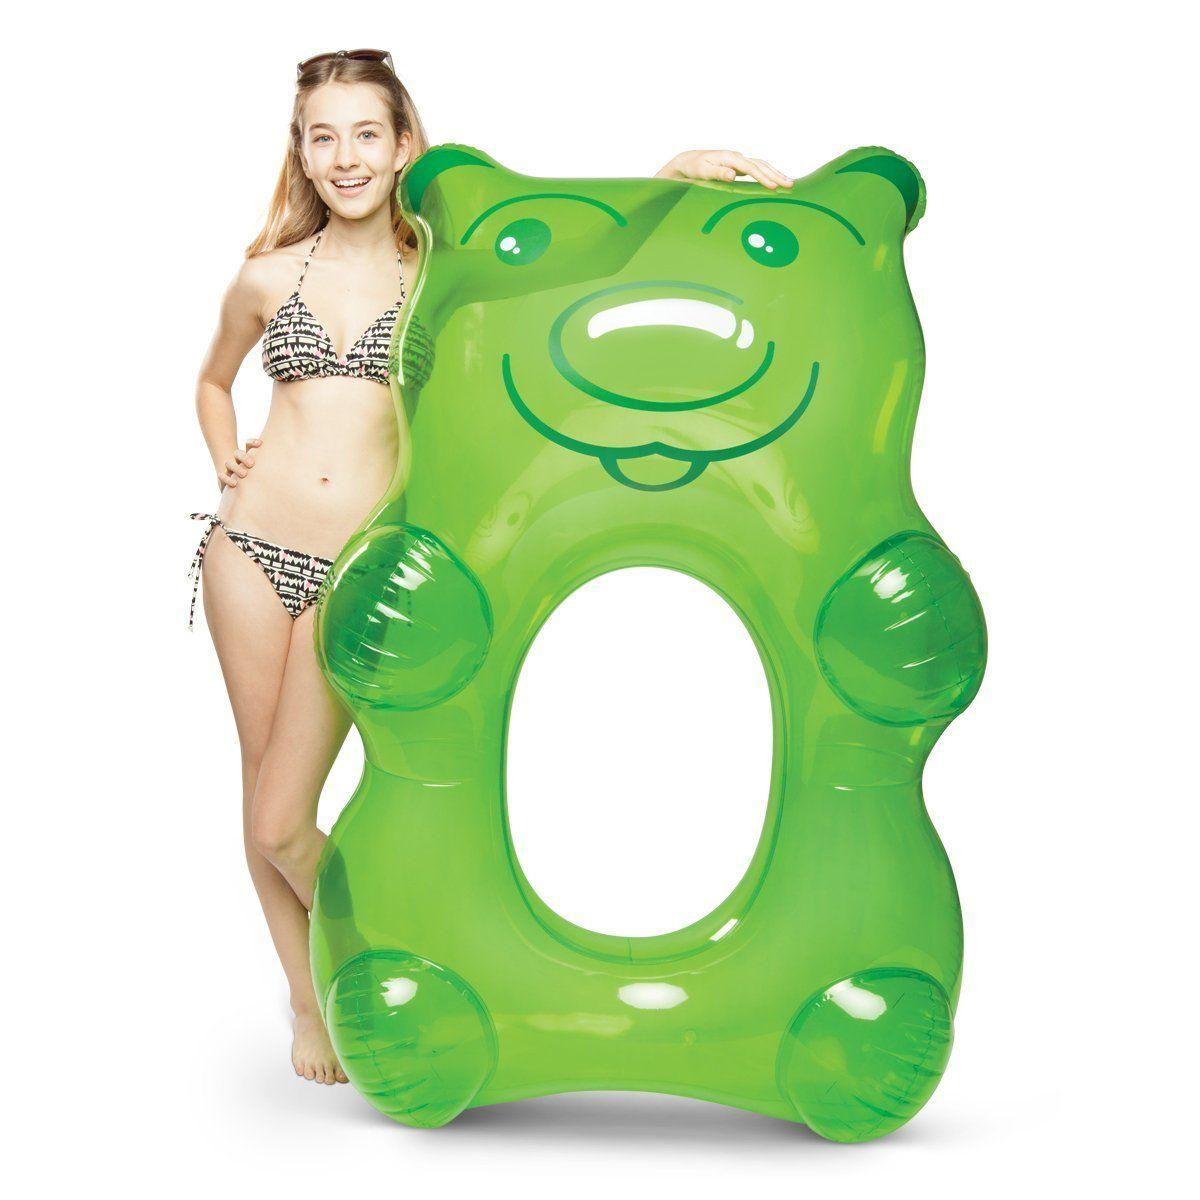 Amazon.com: BigMouth Inc. Giant Green Gummy Bear Pool Float!: Toys ...